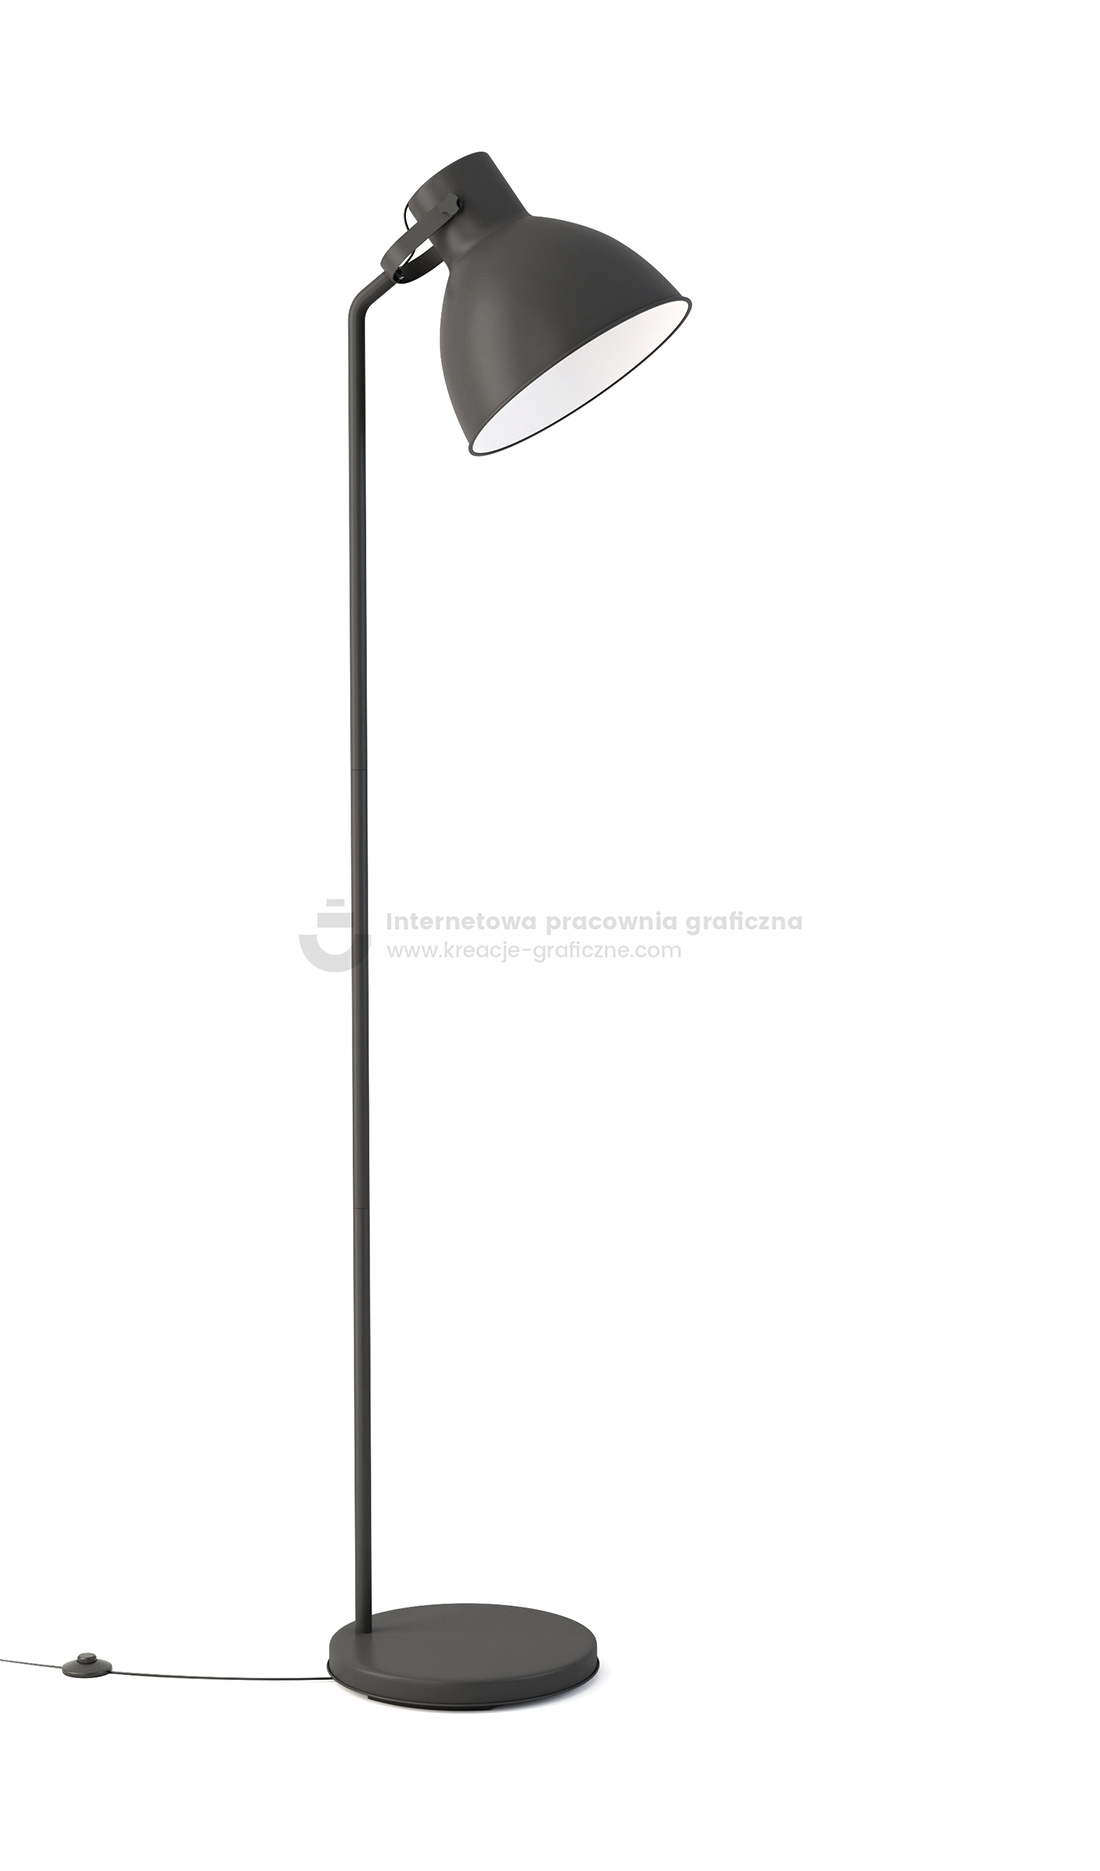 wizualizacje lamp